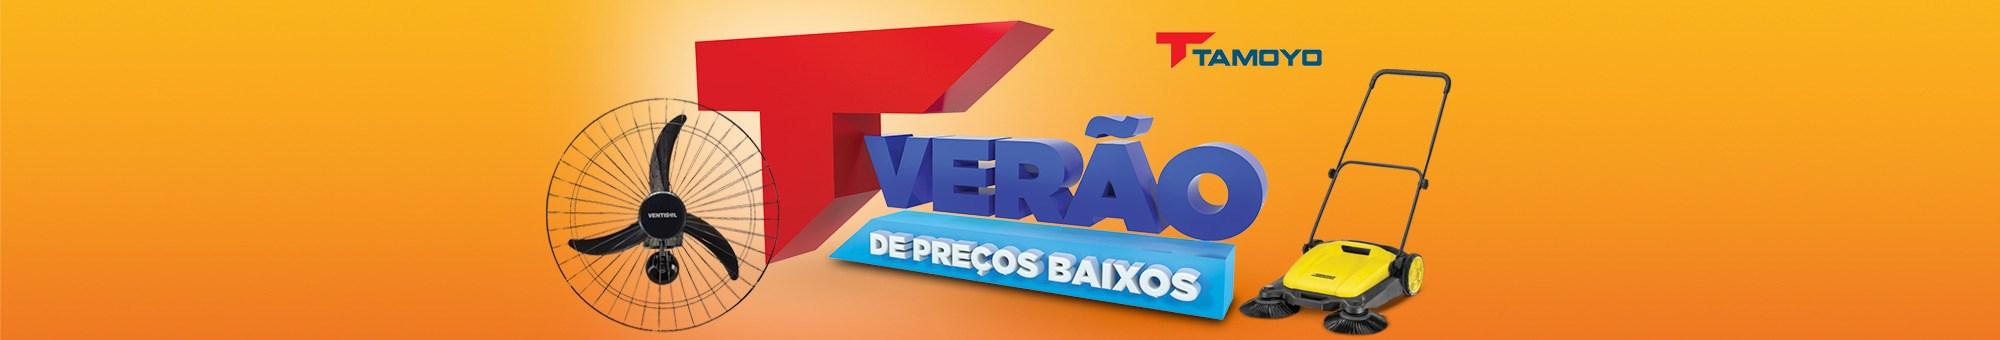 Promoção Lojas Tamoyo